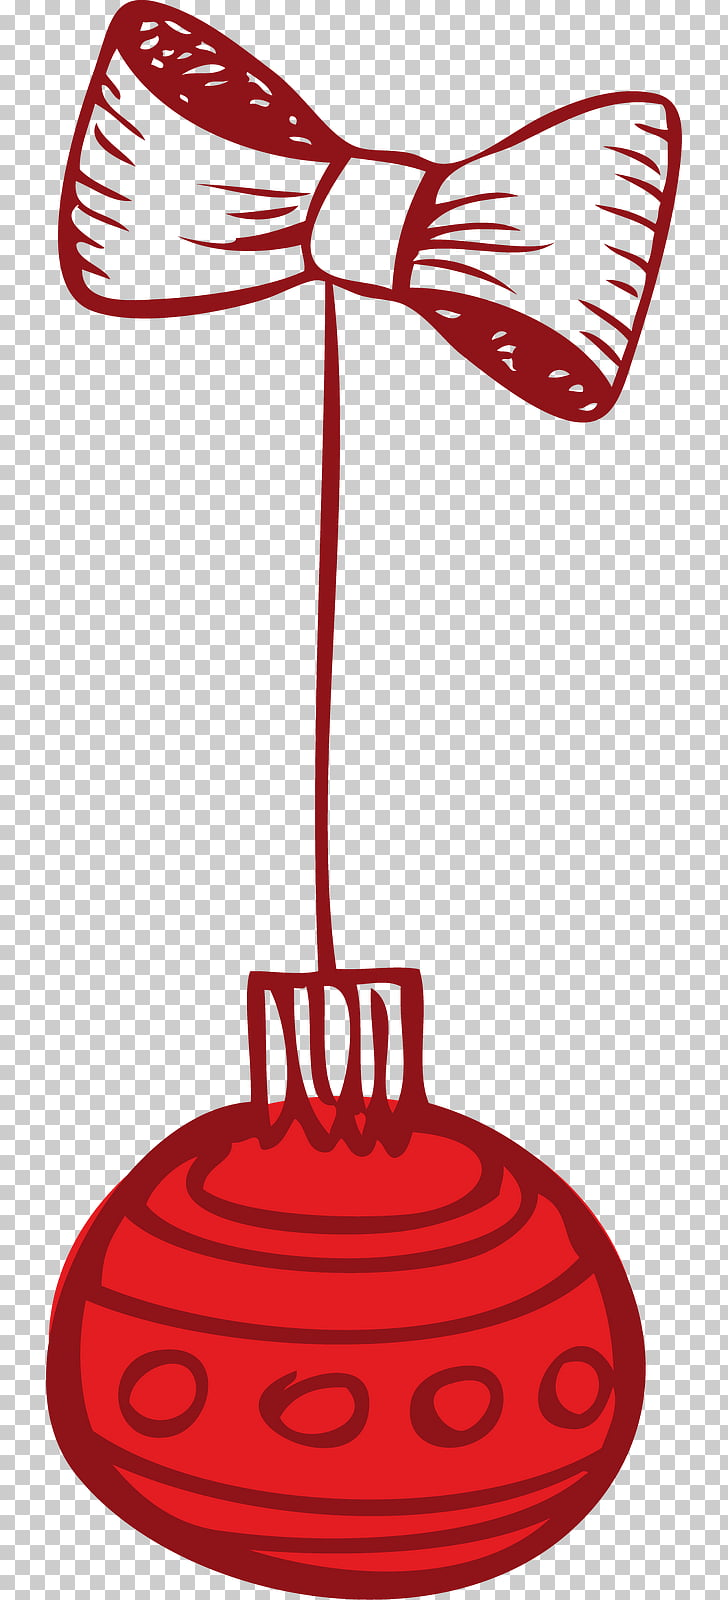 medium resolution of short film animaatio laika animator stop motion enfeites png clipart